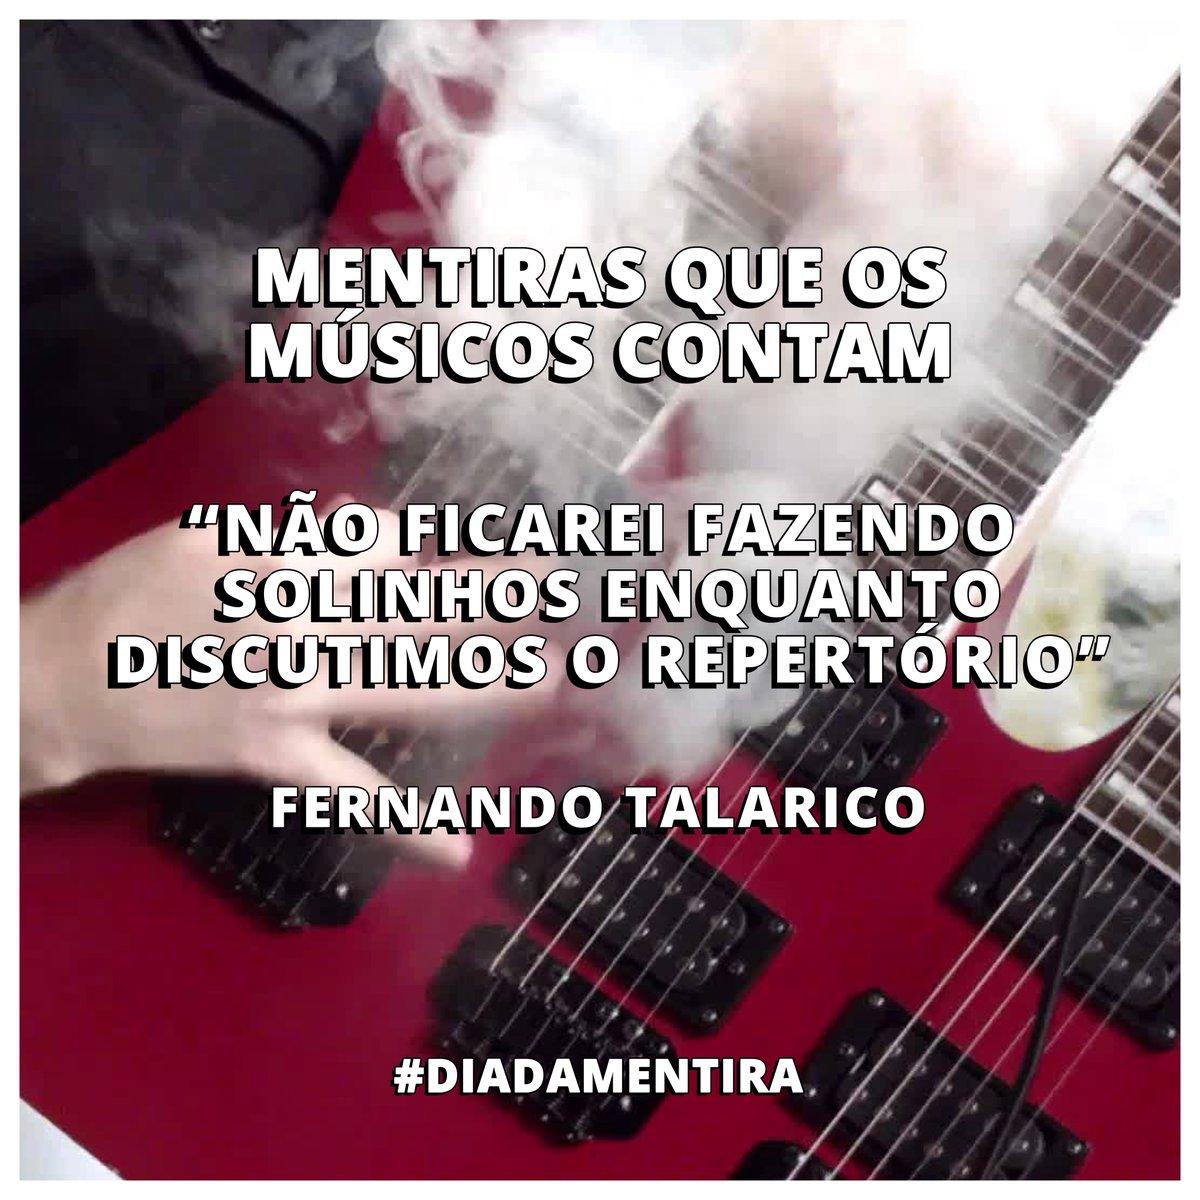 Difícil controlar! Fernando Talarico #diadamentira https://t.co/03InmYgp6c